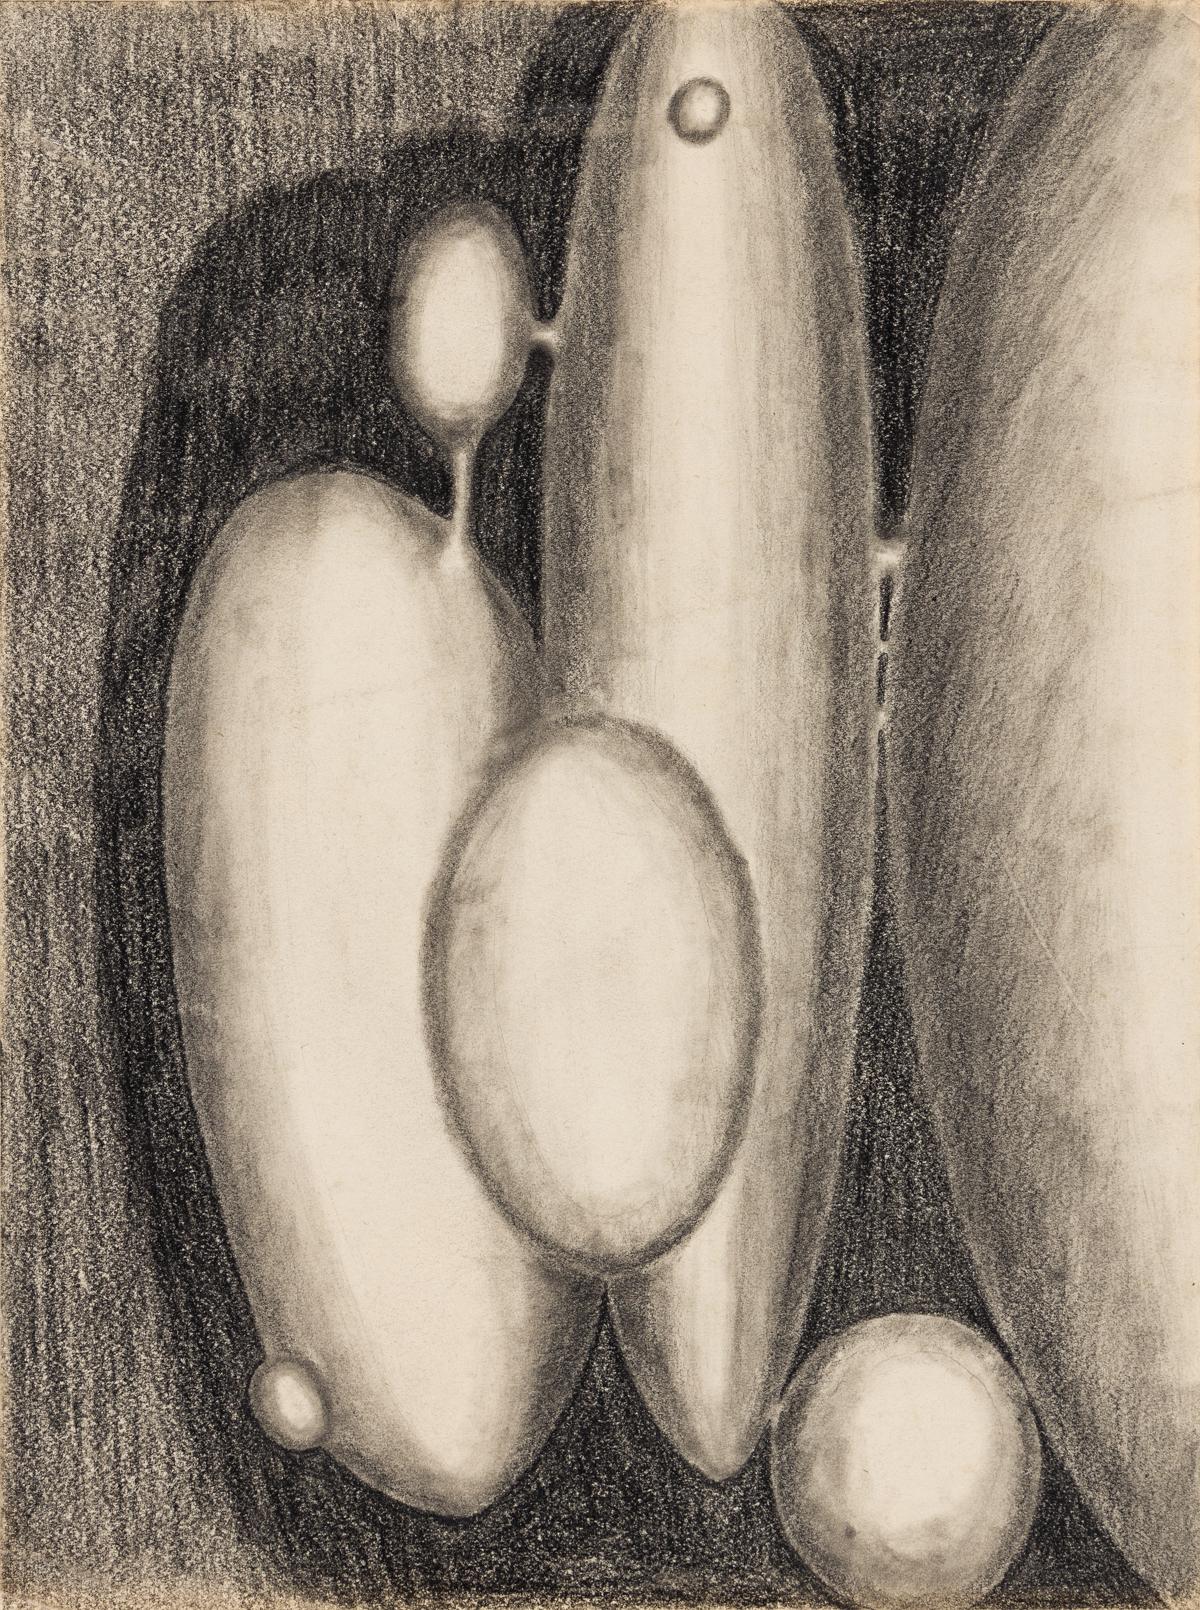 EARL HOOKS (1927 - 2005) Study for Ceramic Sculpture.